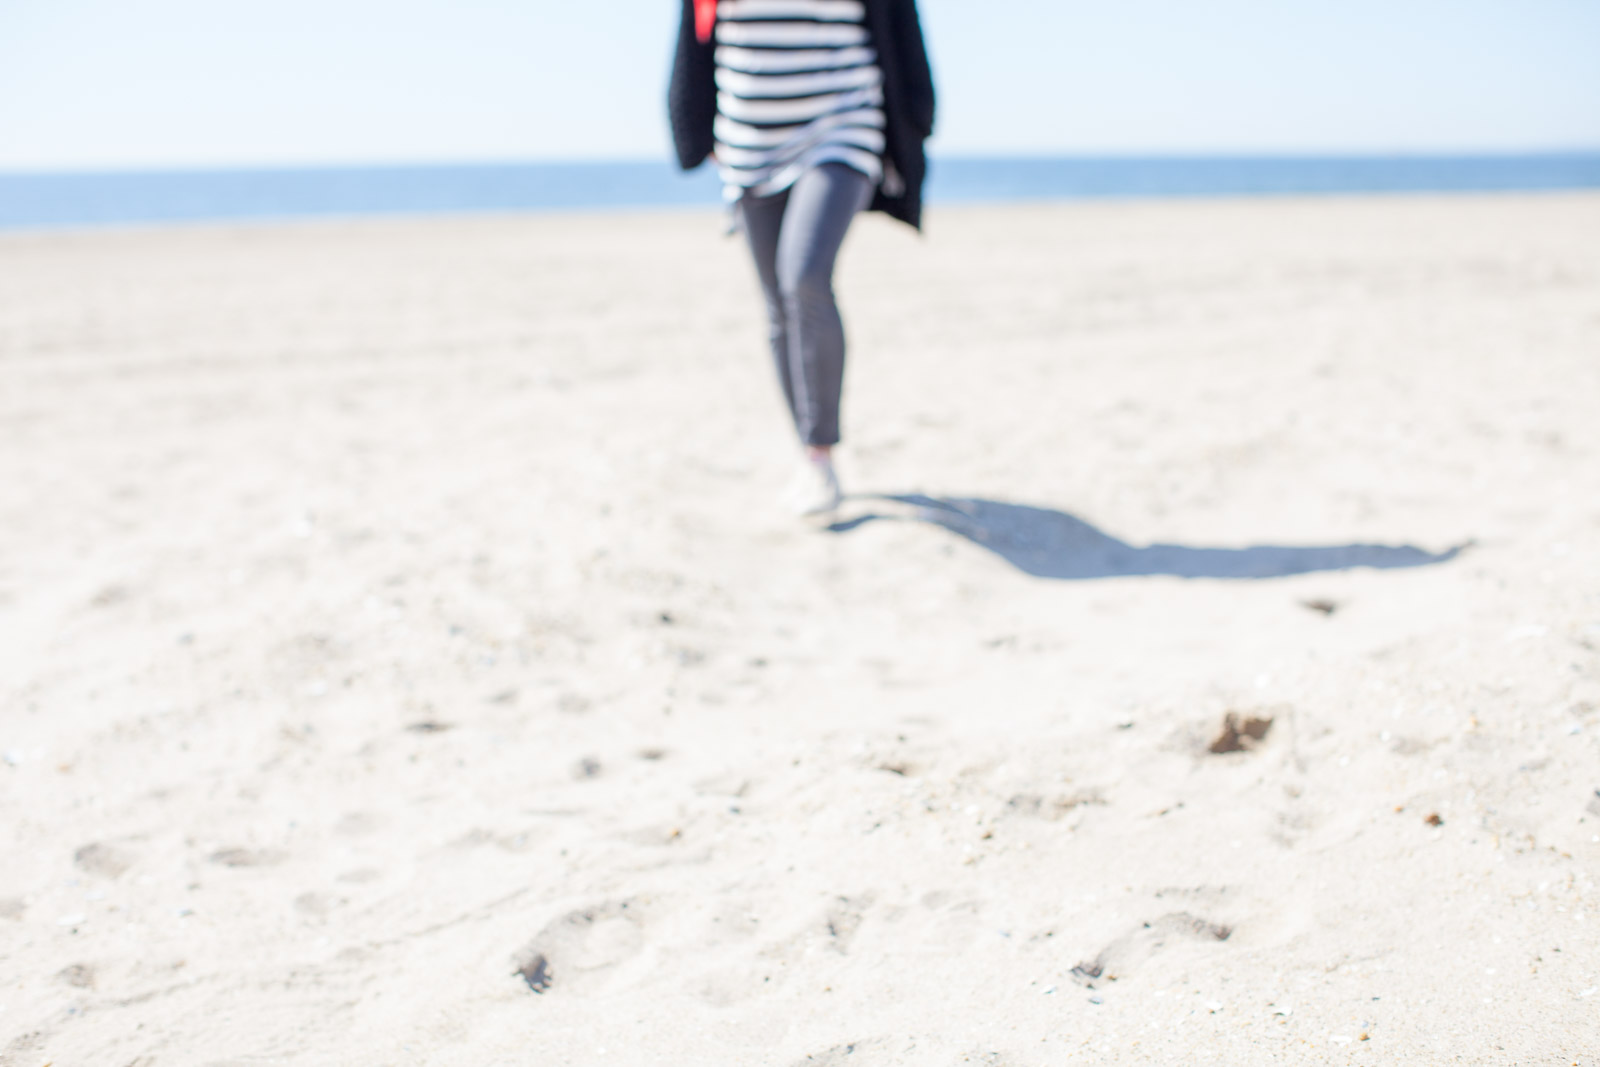 rockaway-beach-april-2015-robertiaga-13